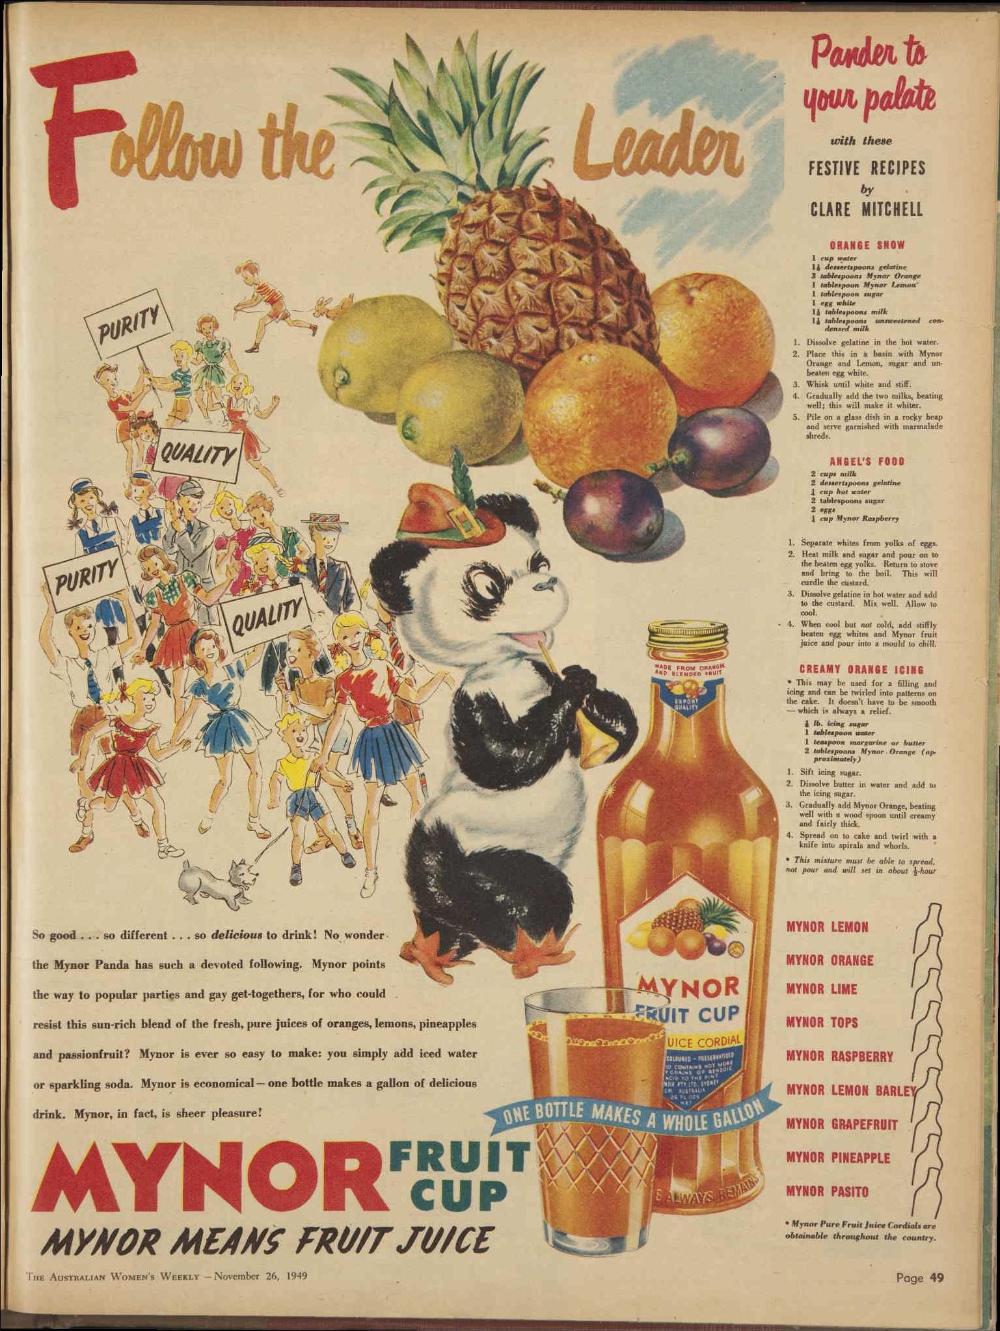 Issue 26 Nov 1949 The Australian Women's Wee